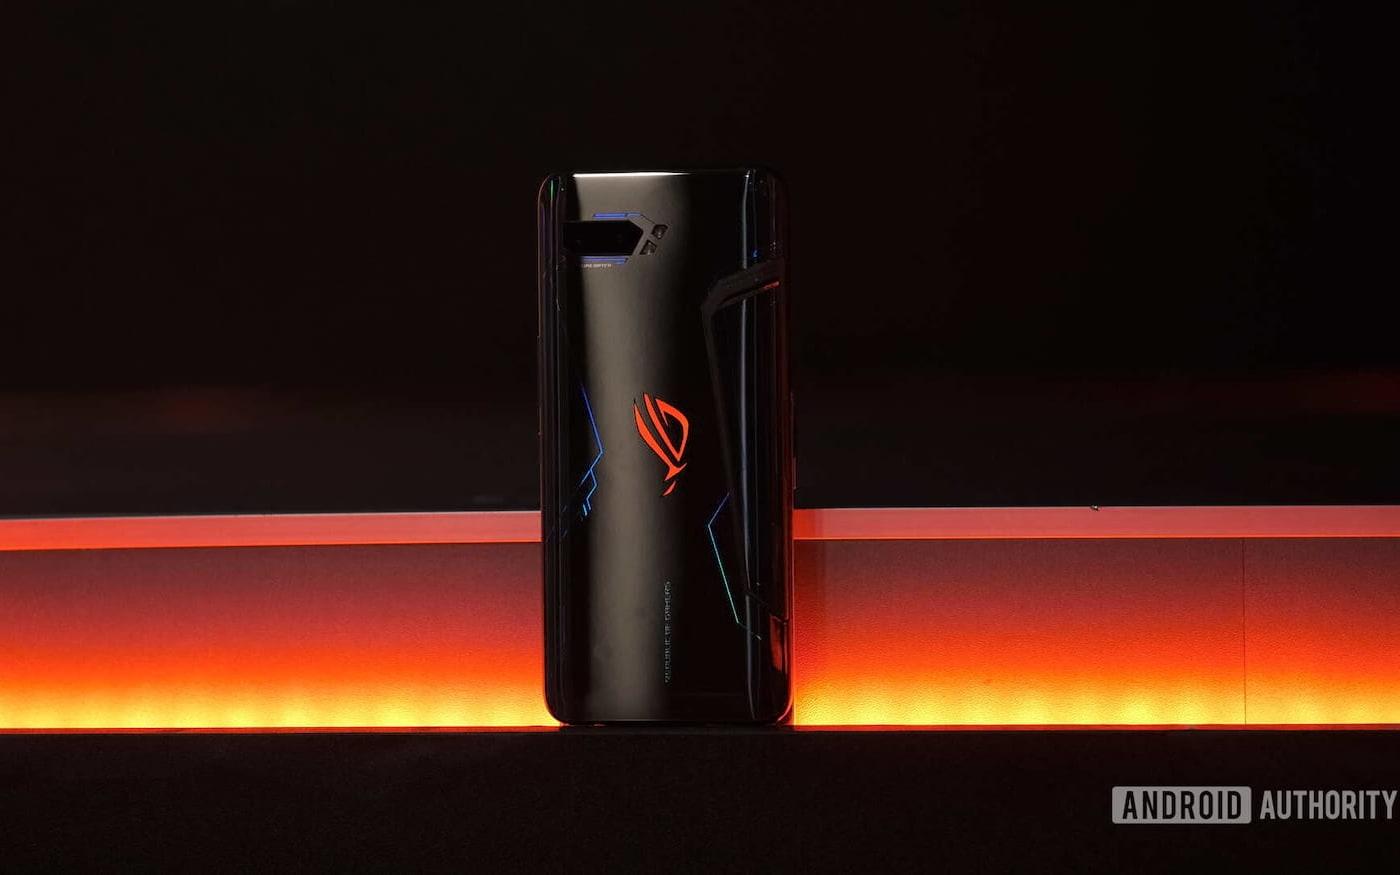 Asus domina ranking Antutu de Agosto com ROG Phone 2 e Zenfone 6